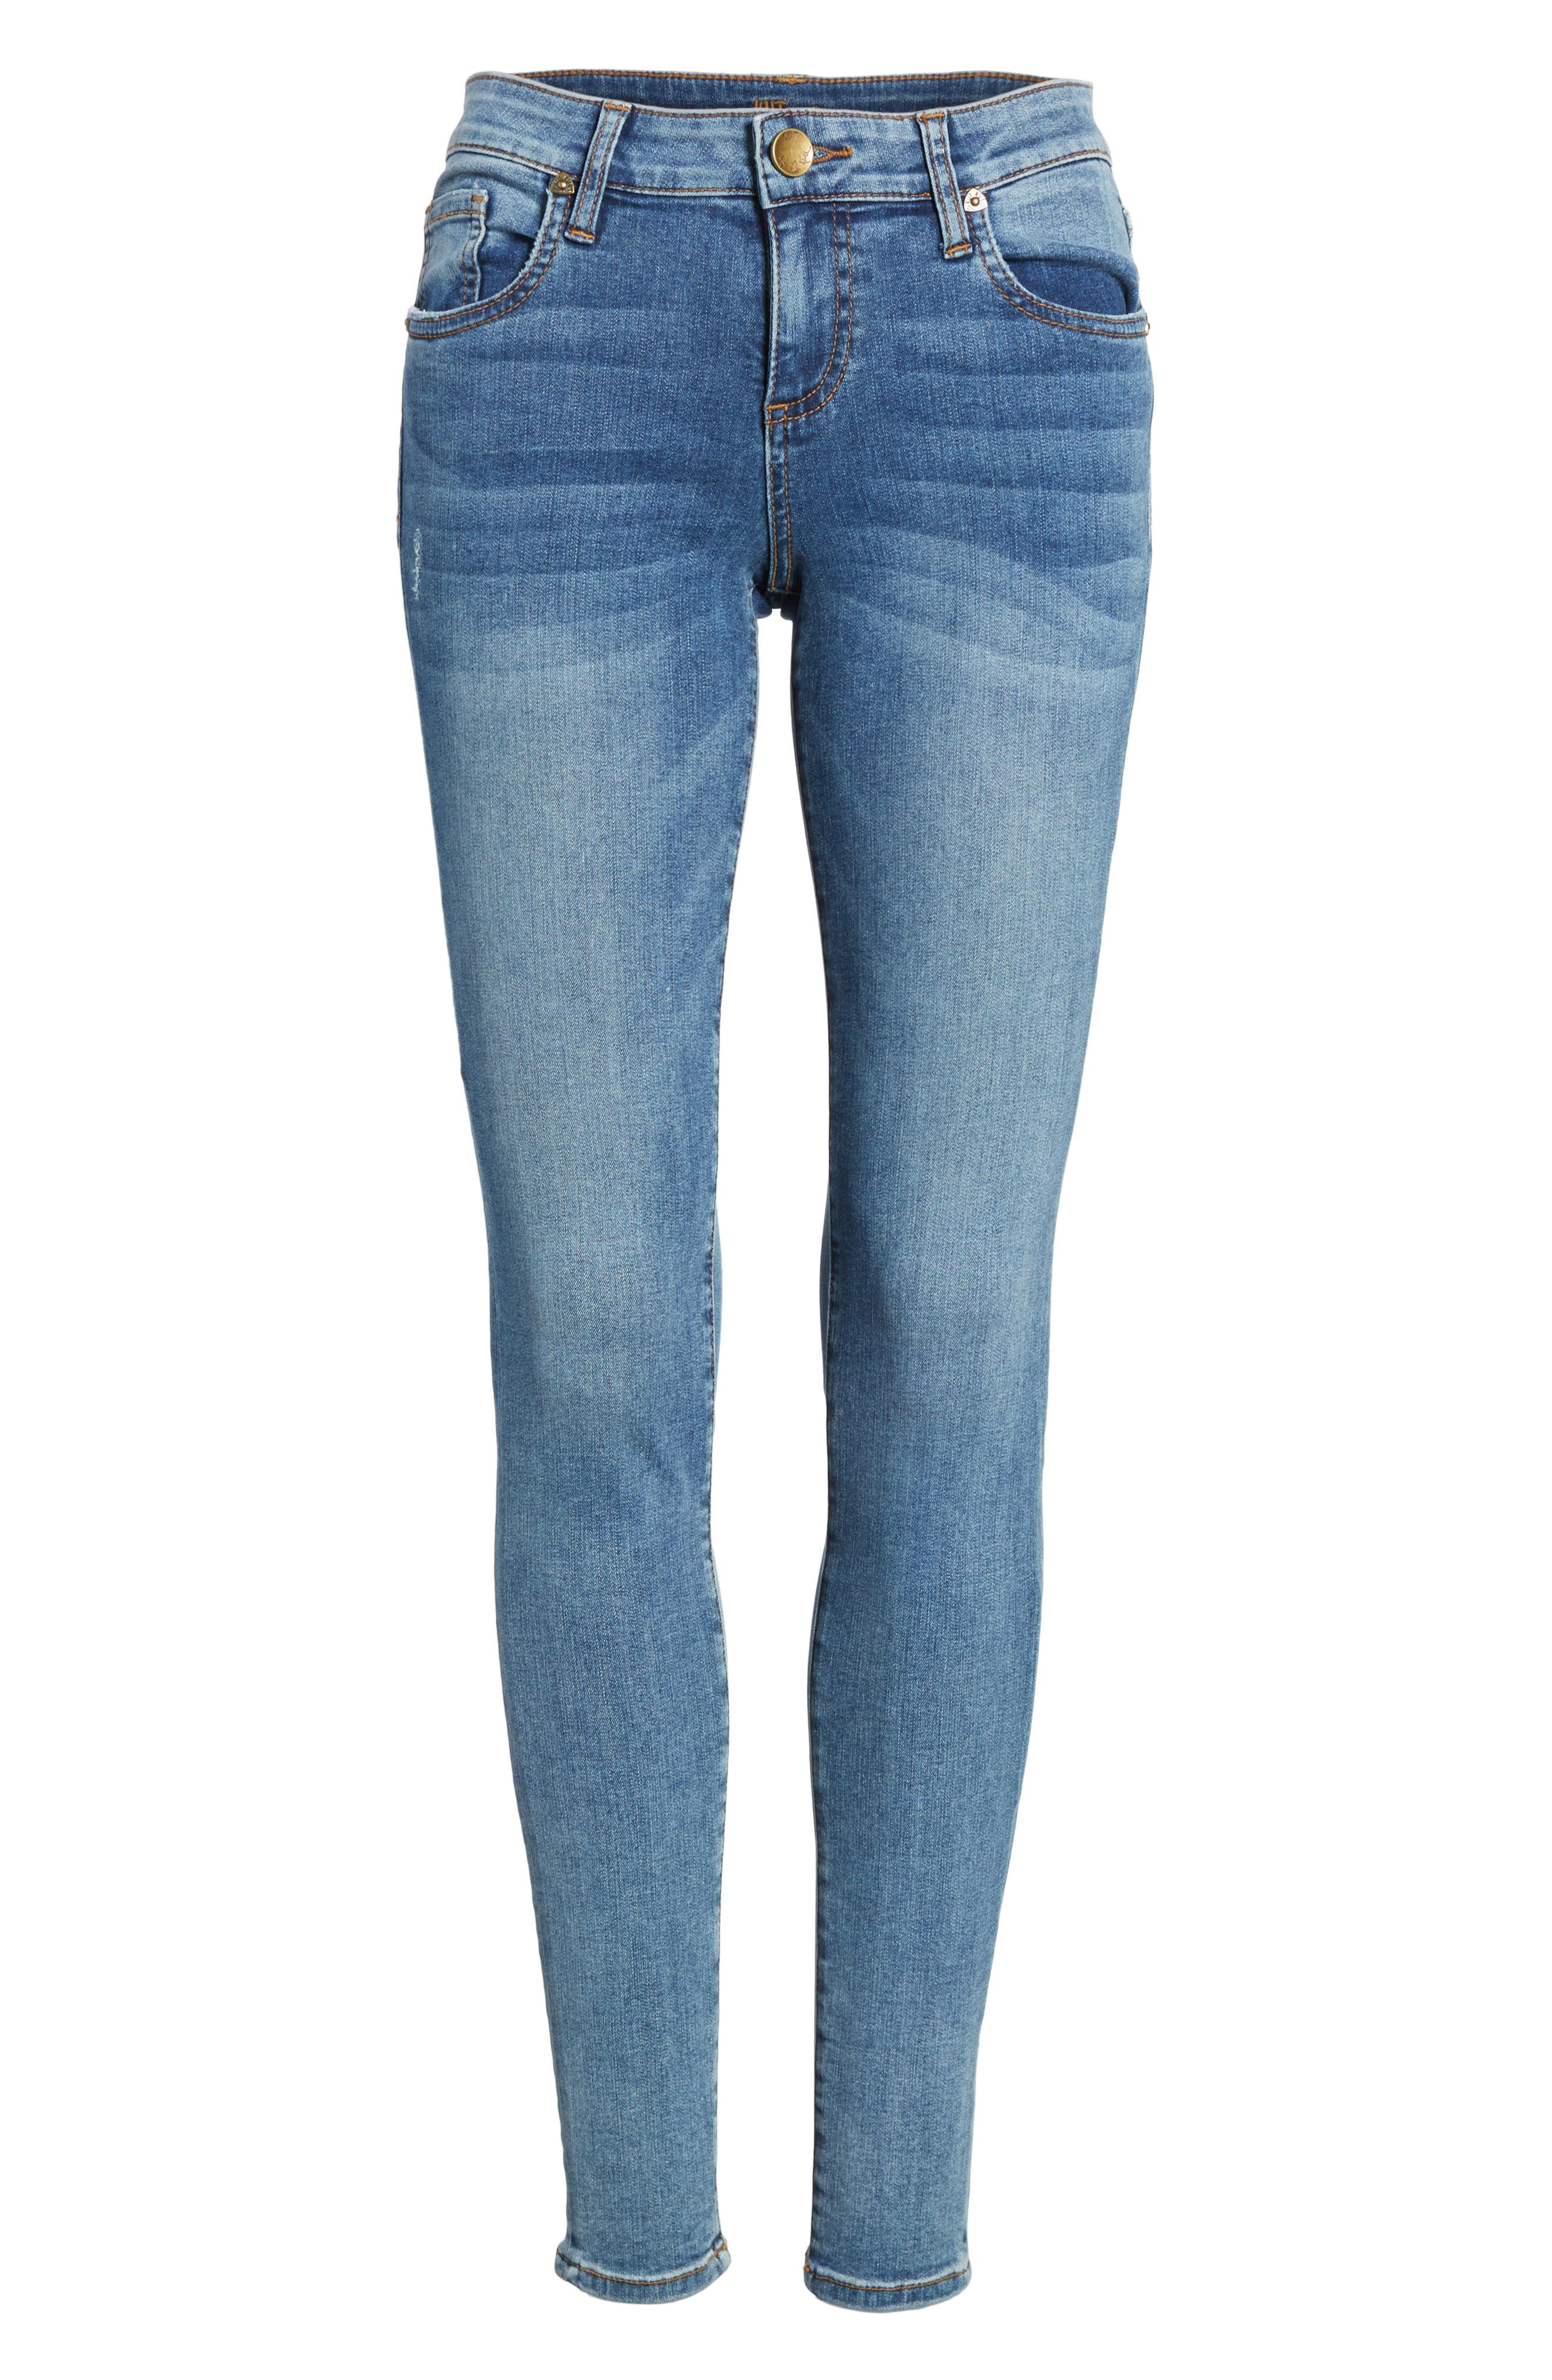 Donna Skinny Jeans,                             Alternate thumbnail 7, color,                             426